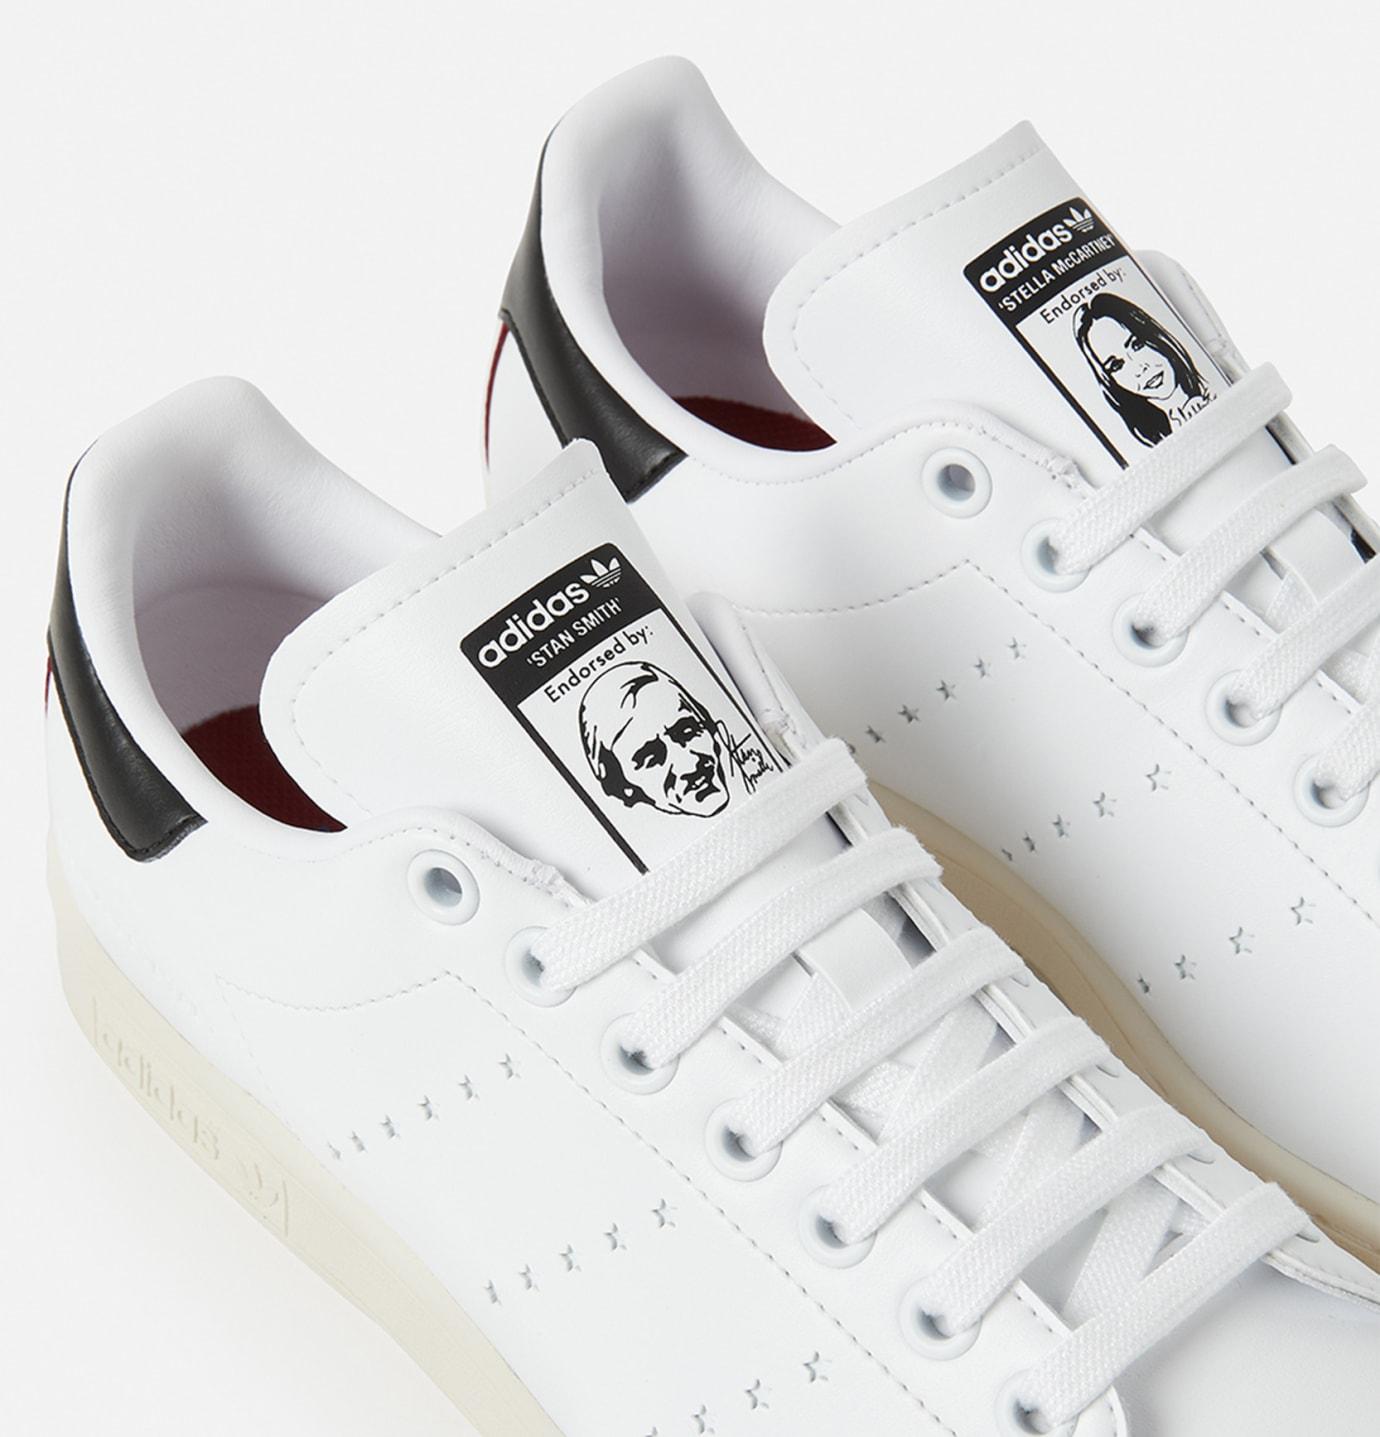 separation shoes 19b02 9b43f Stella McCartney x Adidas Stan Smith Release Date | Sole ...